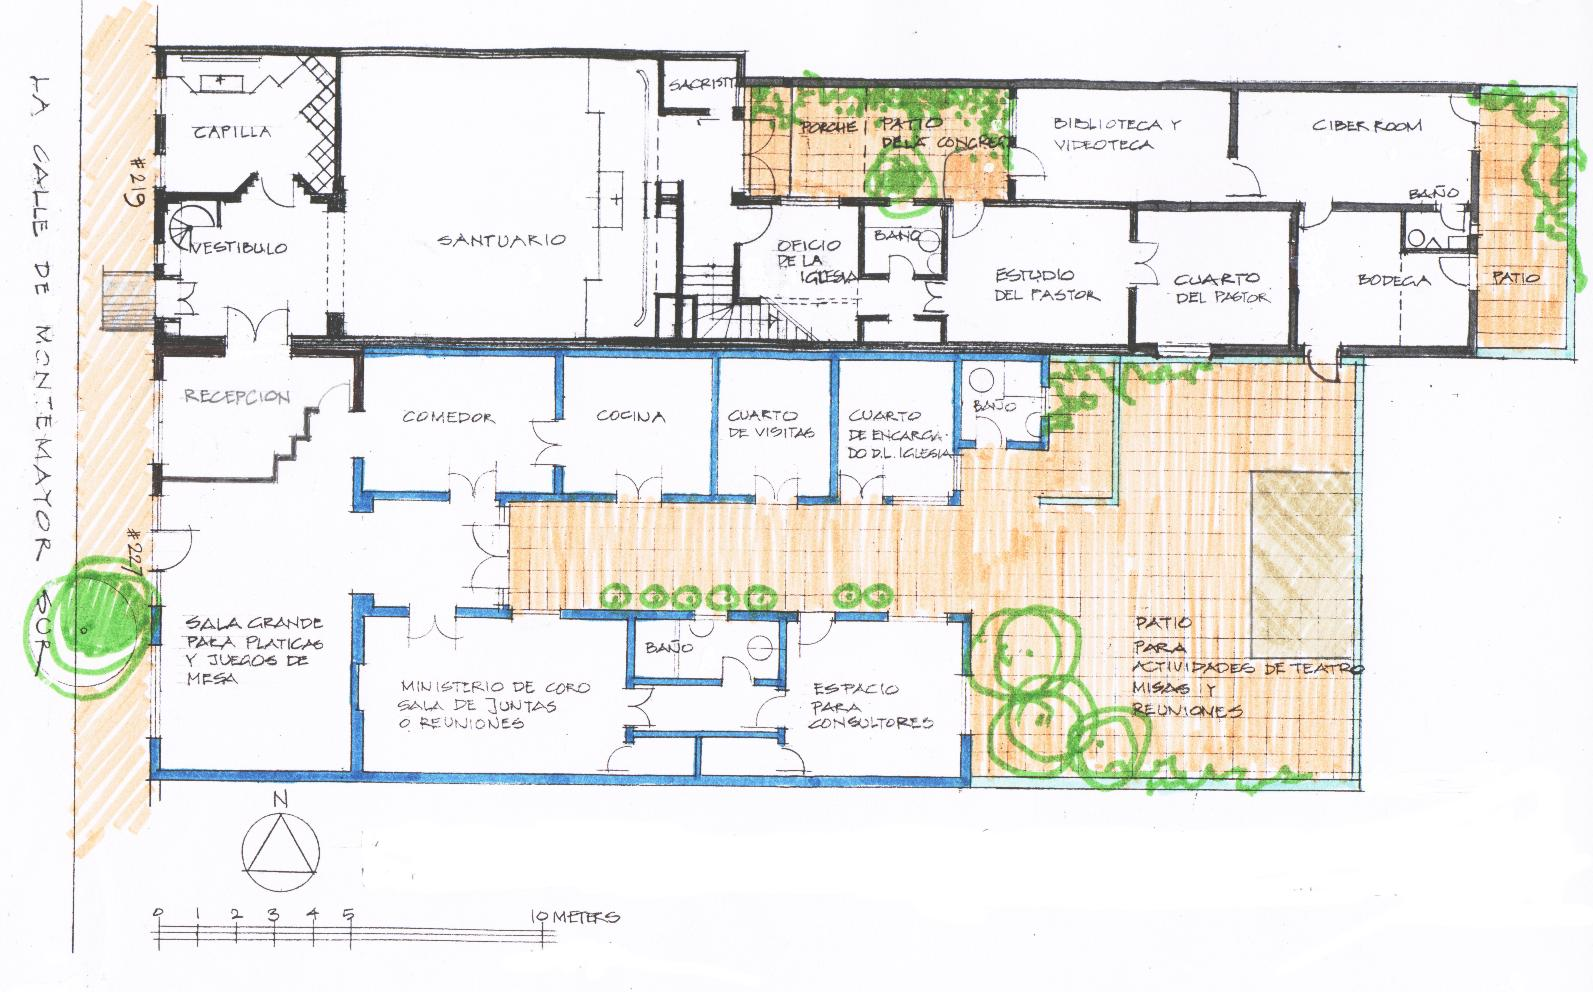 Como hacer planos de una casa diseno de casas 2016 for Programas para crear planos arquitectonicos